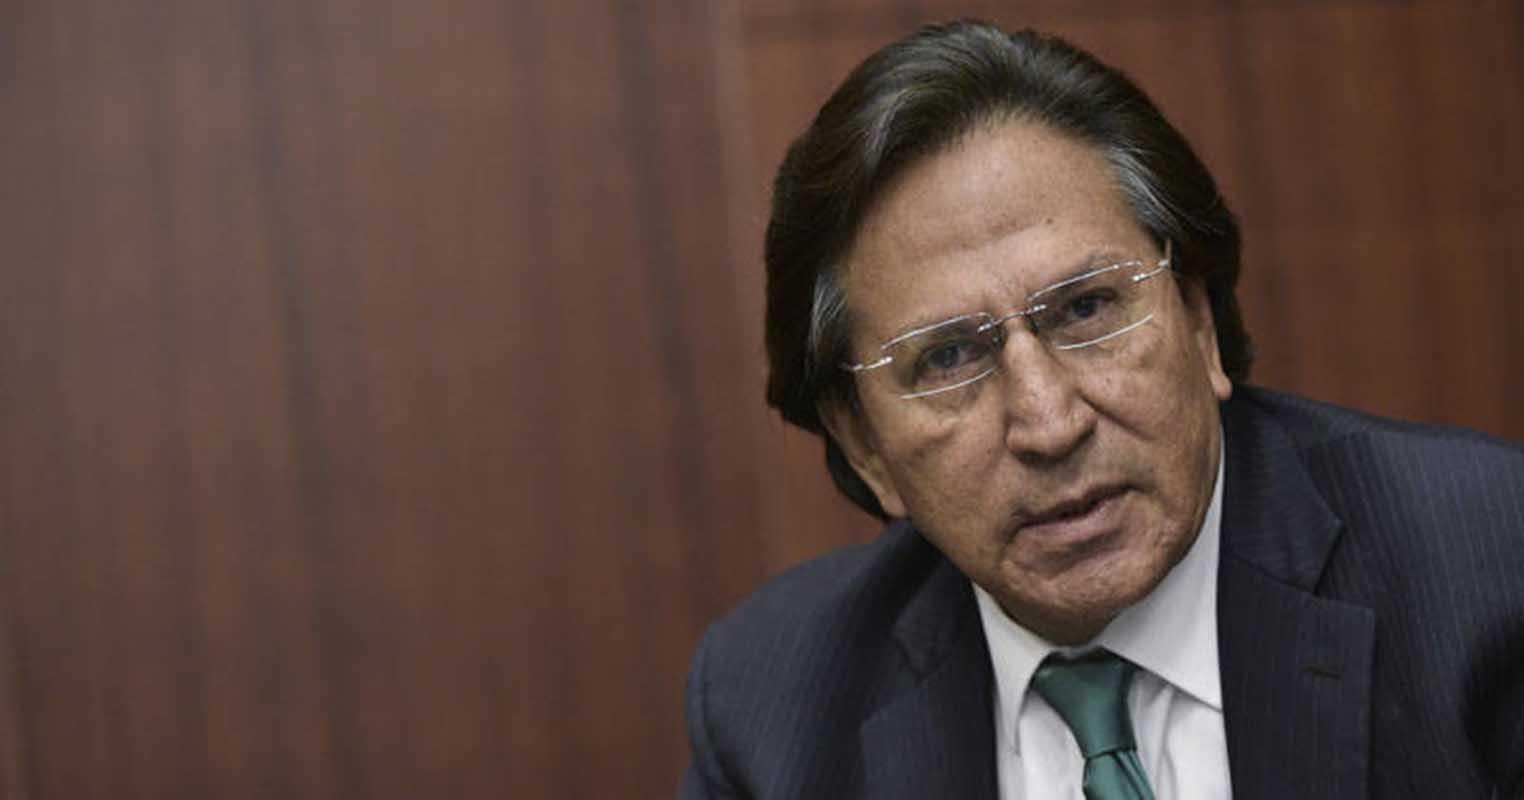 Expresidente Toledo reitera que no ha recibido dinero de Odebrecht